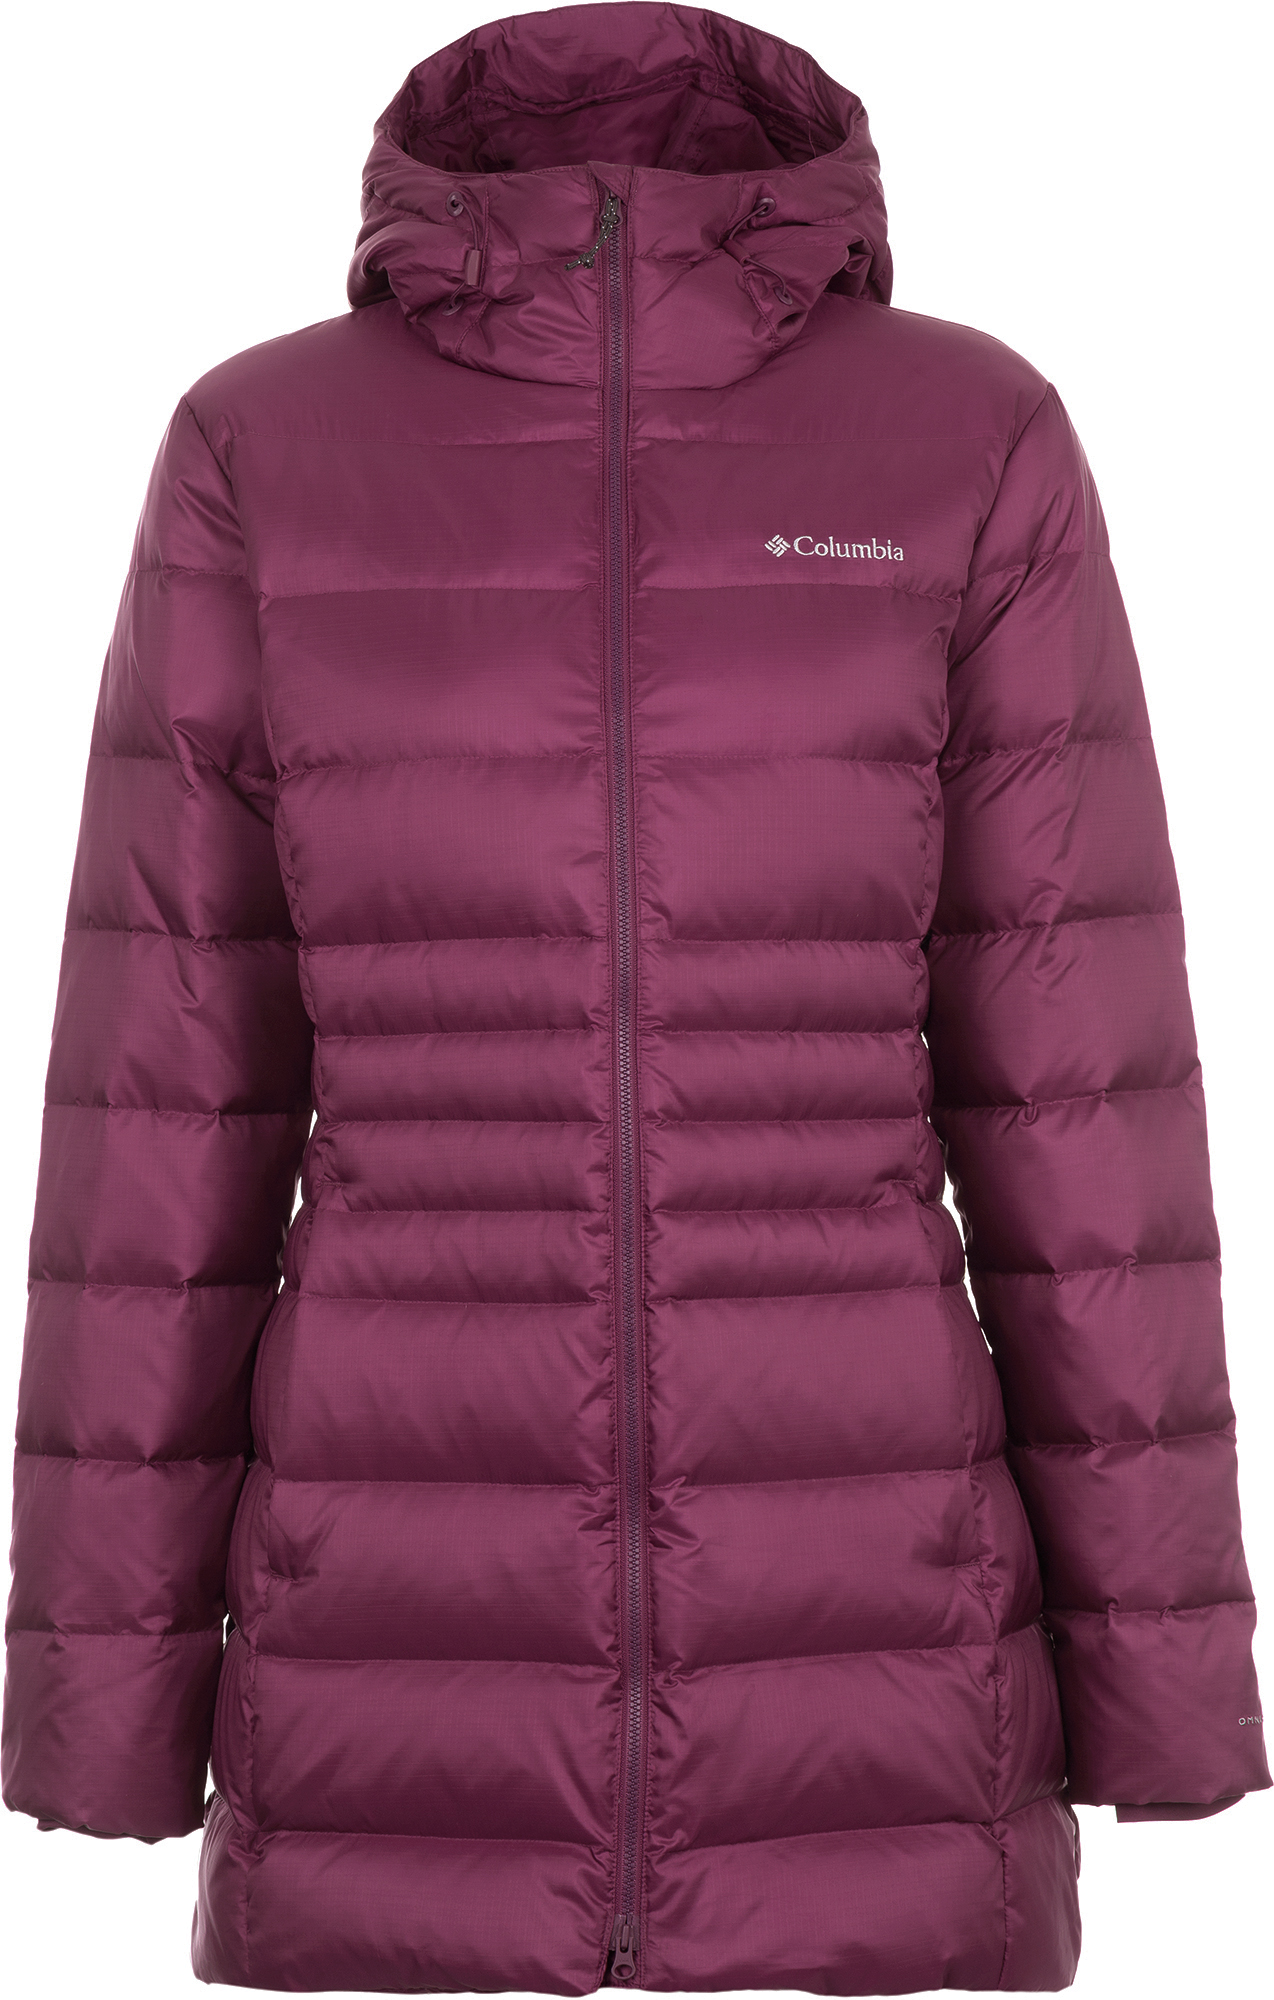 Columbia Куртка пуховая женская Columbia Hellfire, размер 42 цена